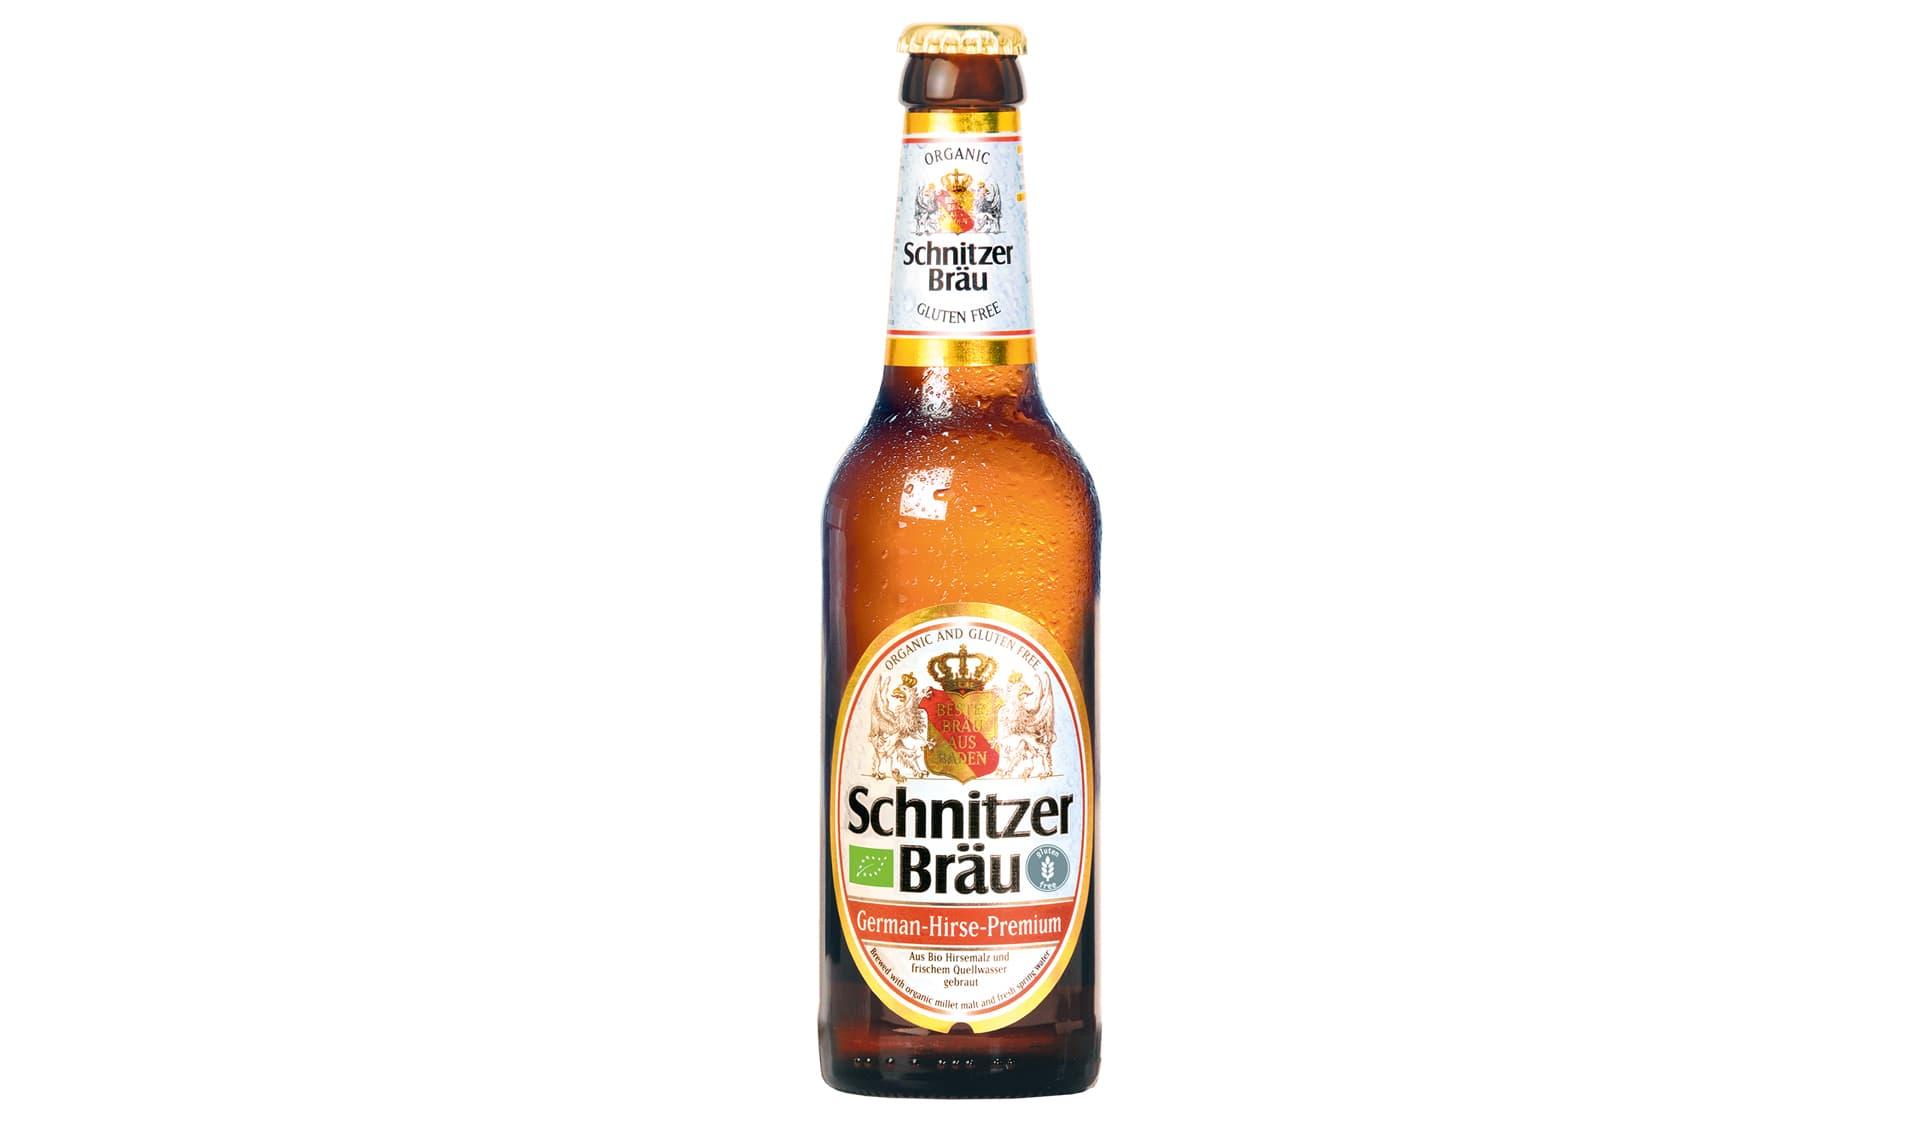 Schnitzer Bräu German Hirse-Premium (www.schnitzerbraeu.de)